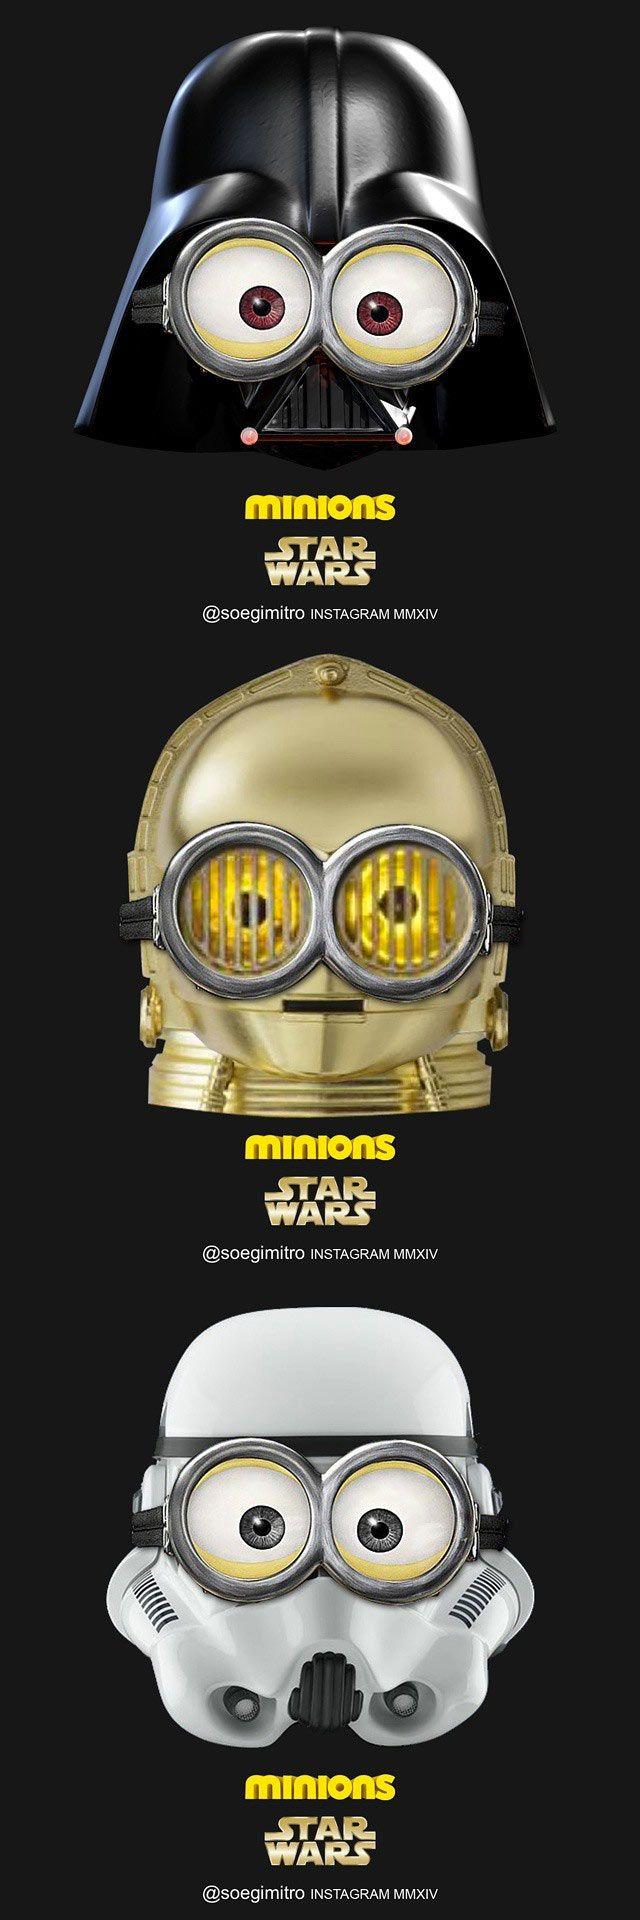 Star Wars Minions. #humor #risa #graciosas #chistosas #divertidas